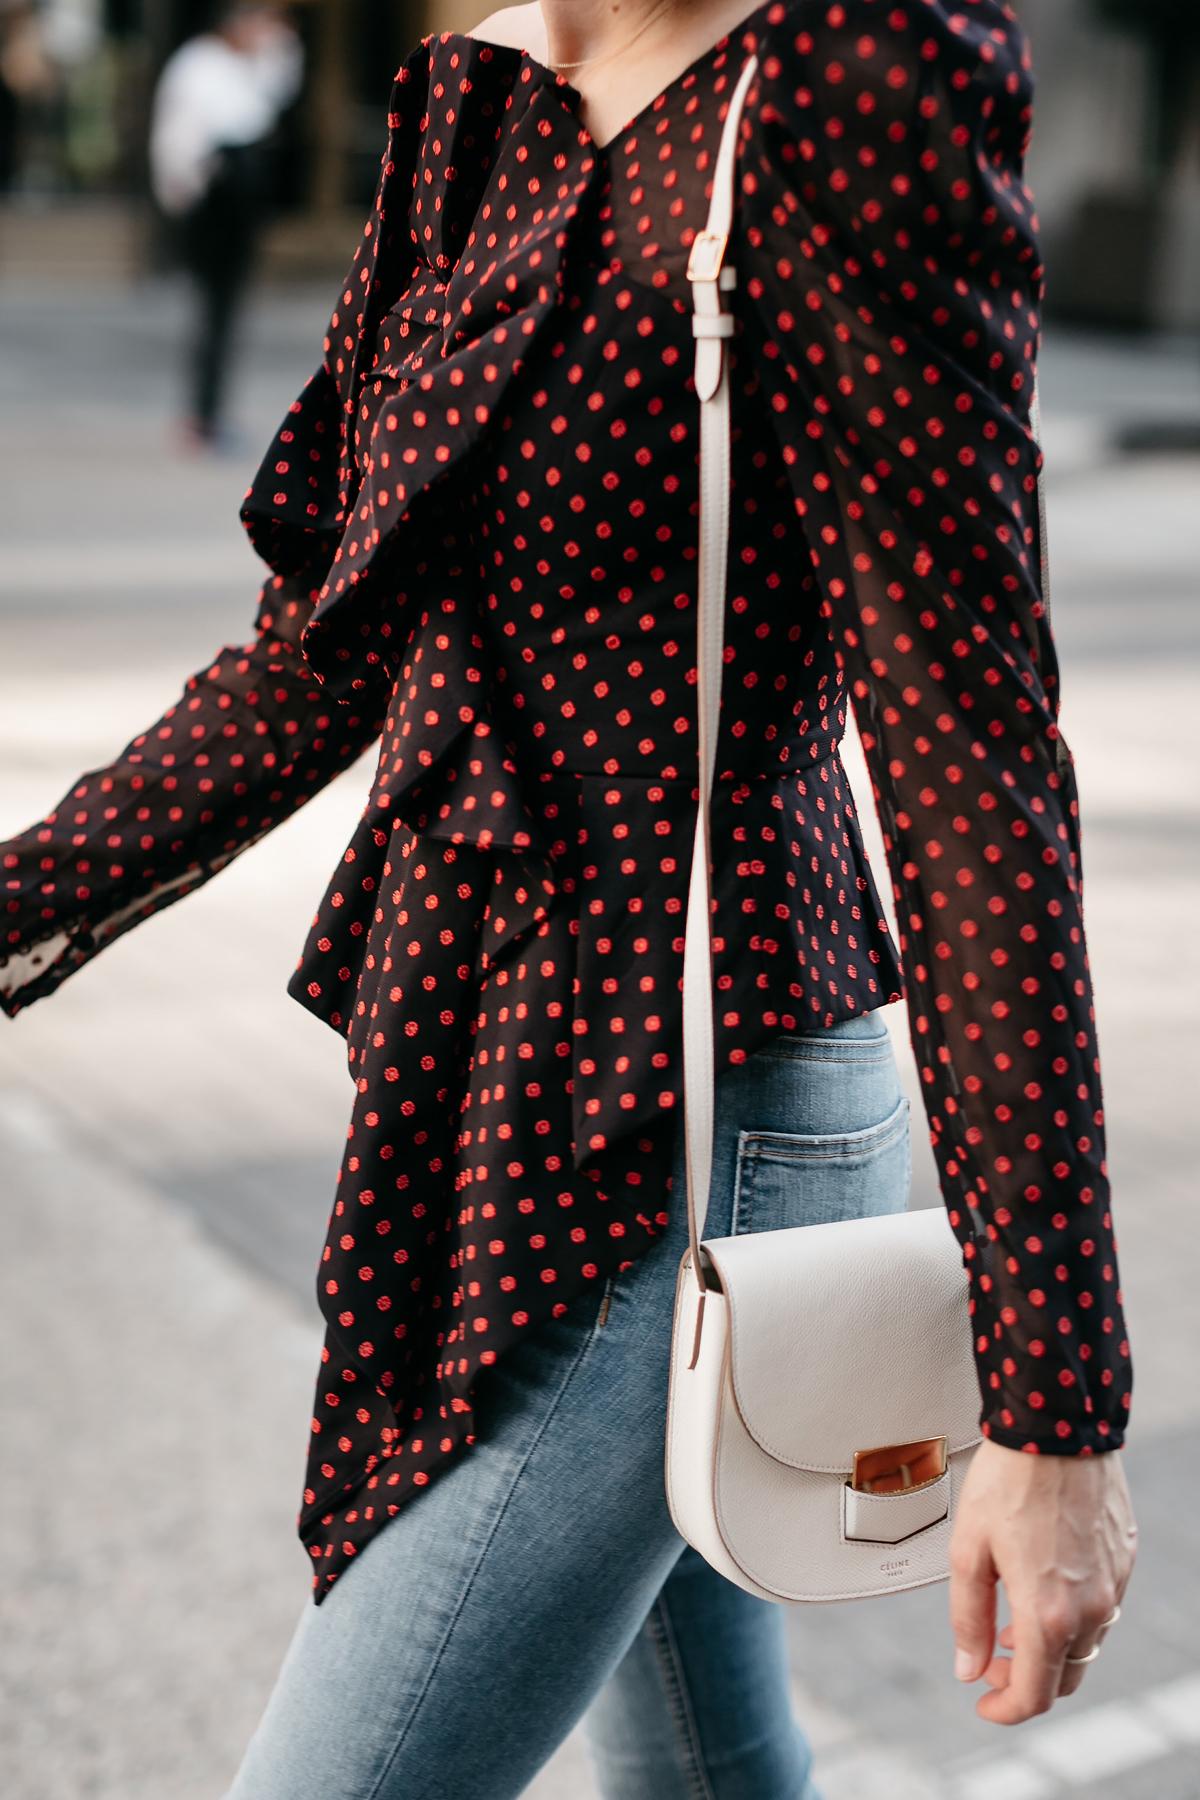 Woman Wearing Self Portrait One-shoulder Embroidered Top Celine White Trotteur Fashion Jackson Dallas Blogger Fashion Blogger Street Style